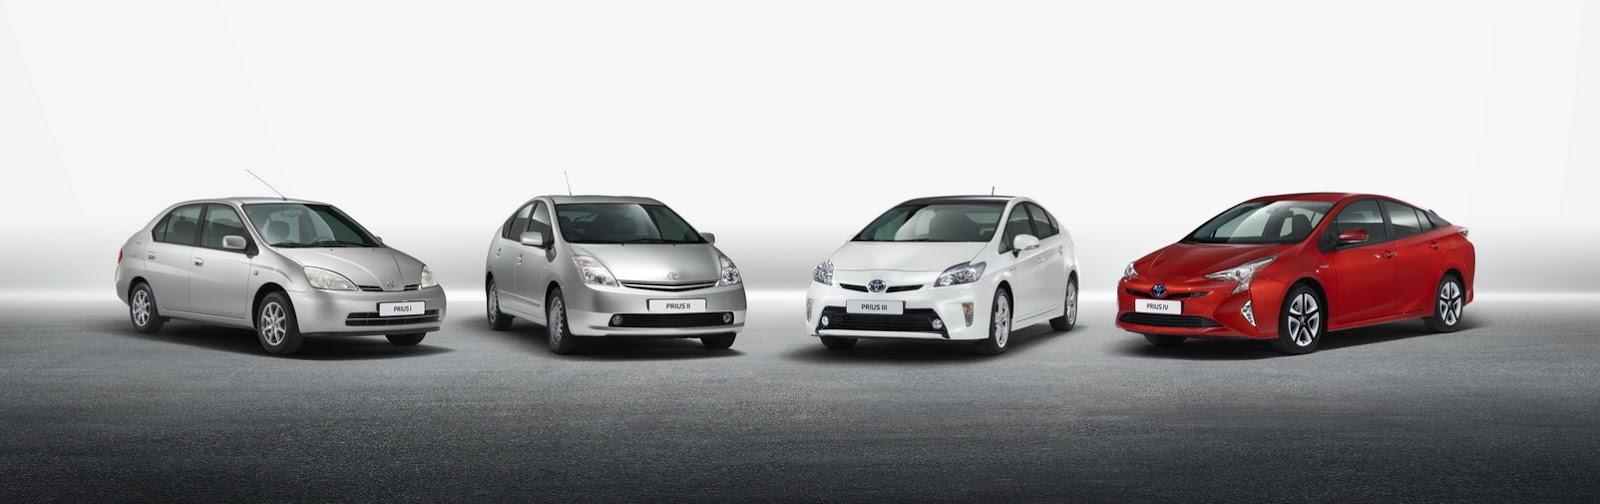 Nuova-Toyota-Prius-2016-13